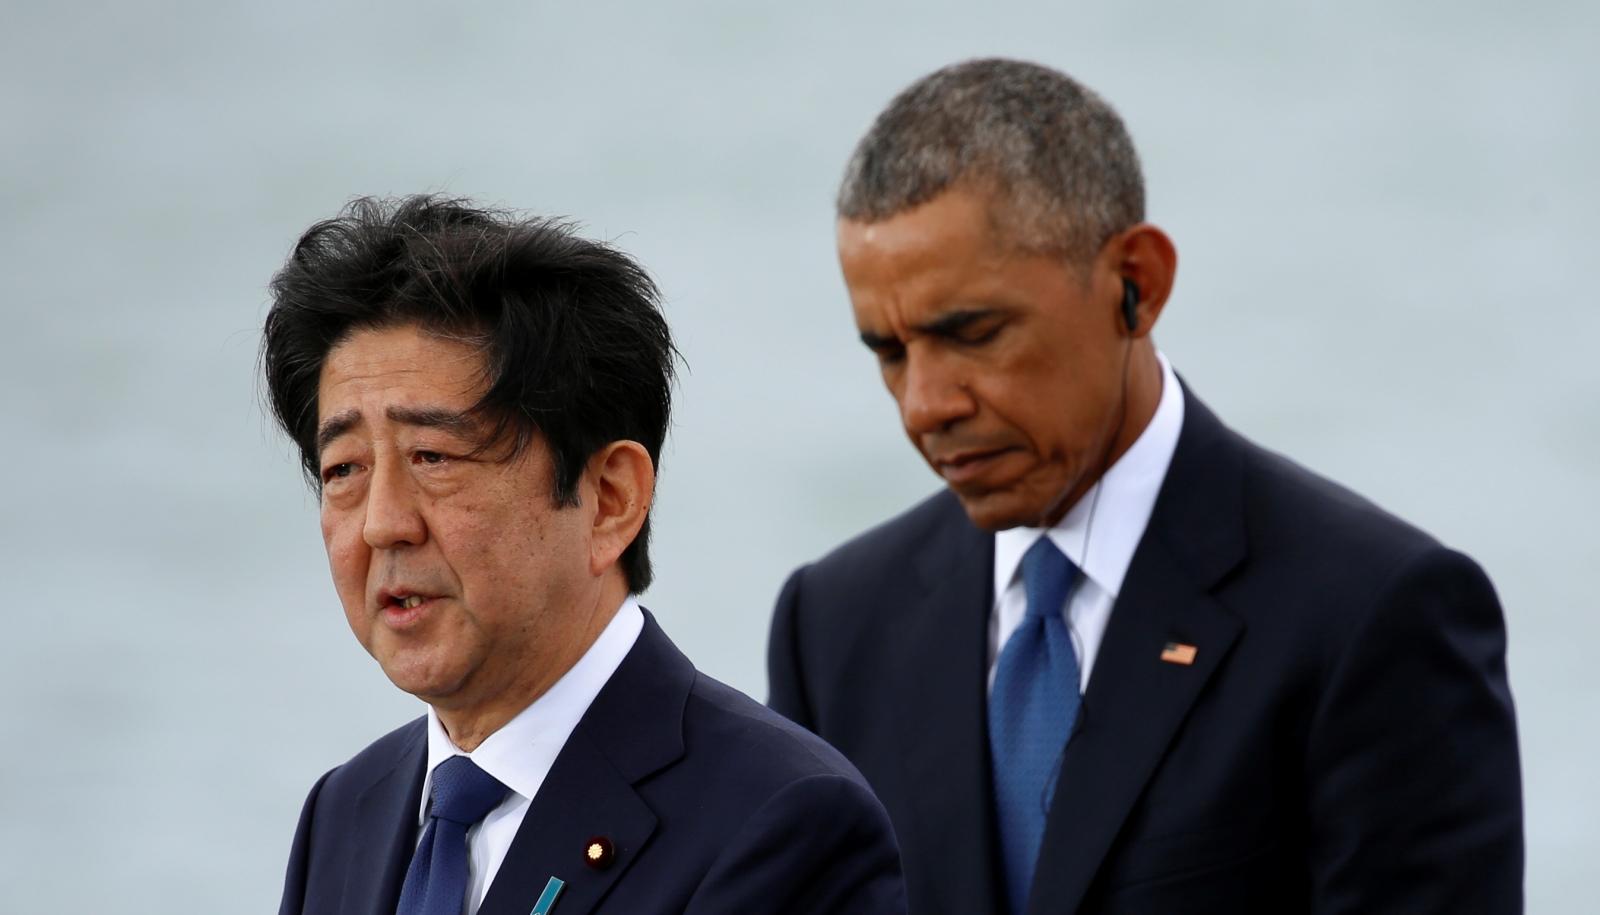 Japanese PM to Visit Pearl Harbor Alongside Obama